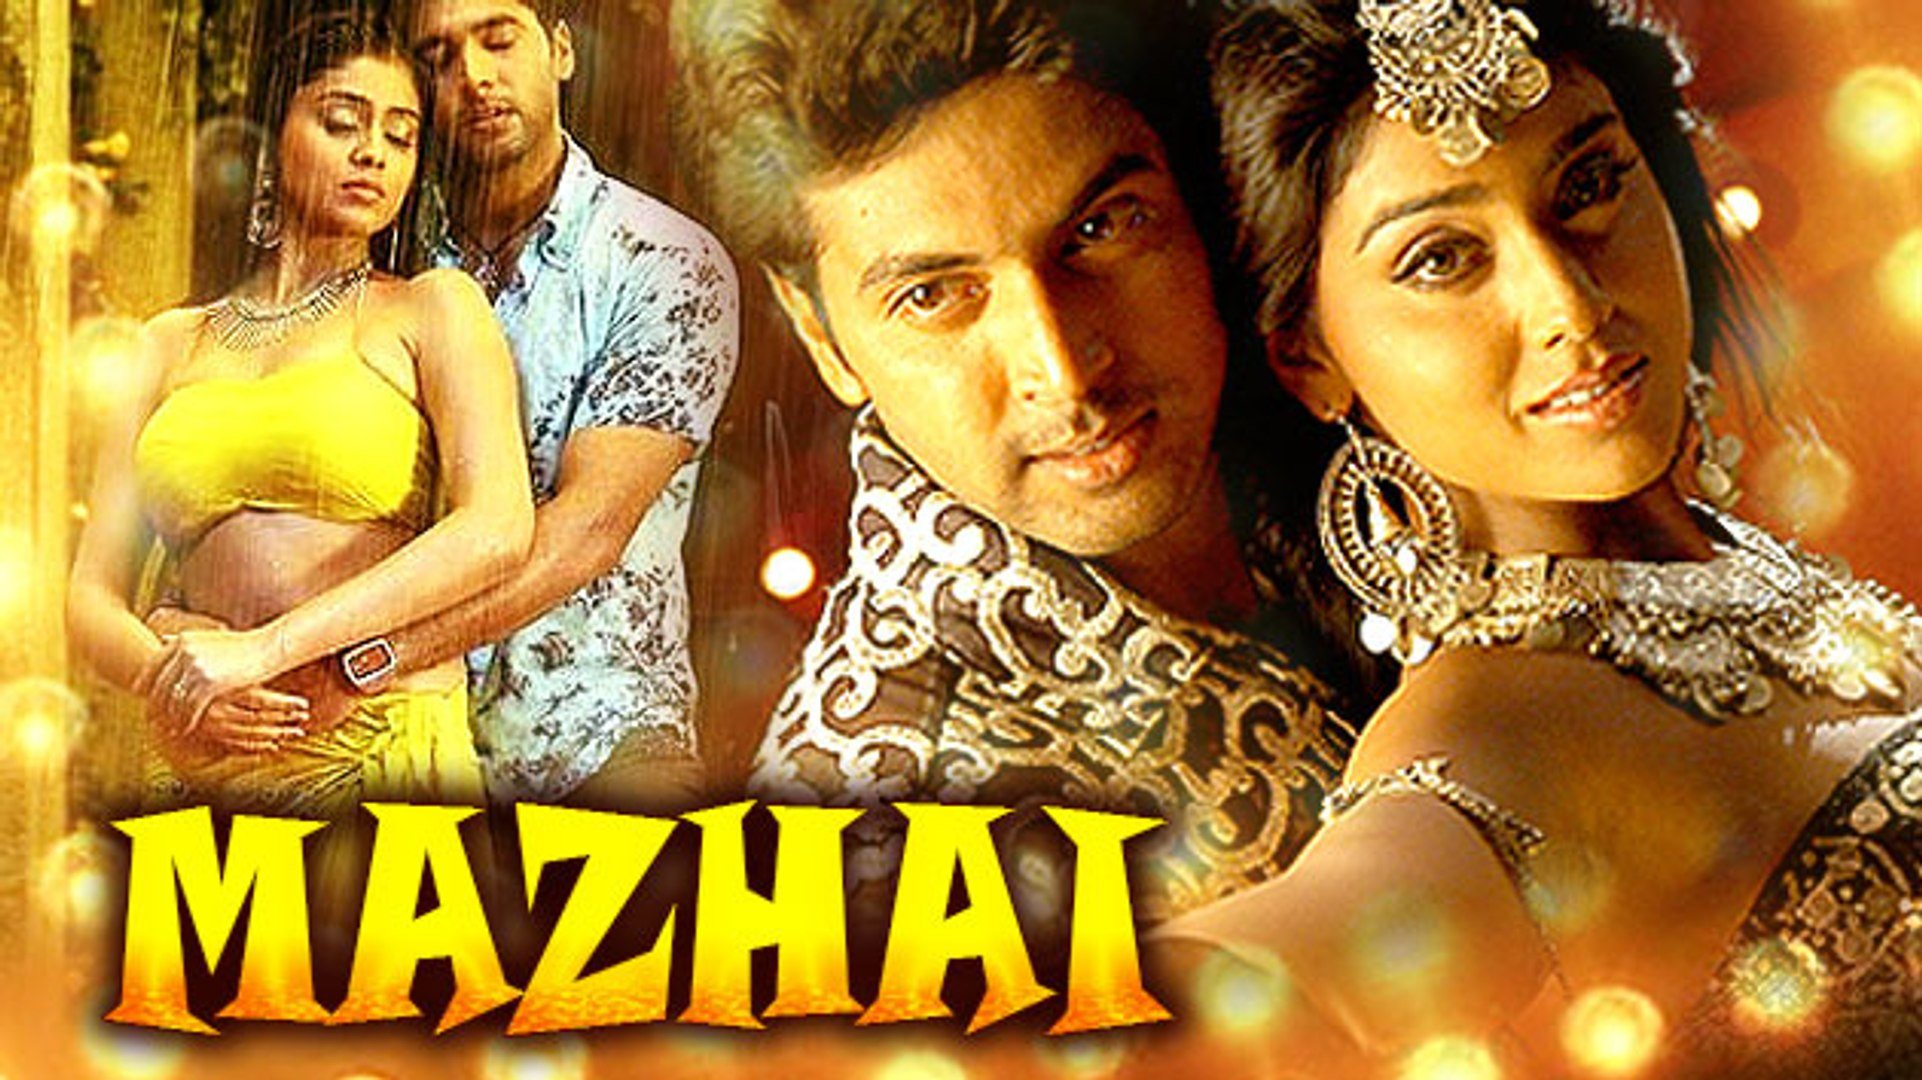 tamil movie mazhai full movie free download